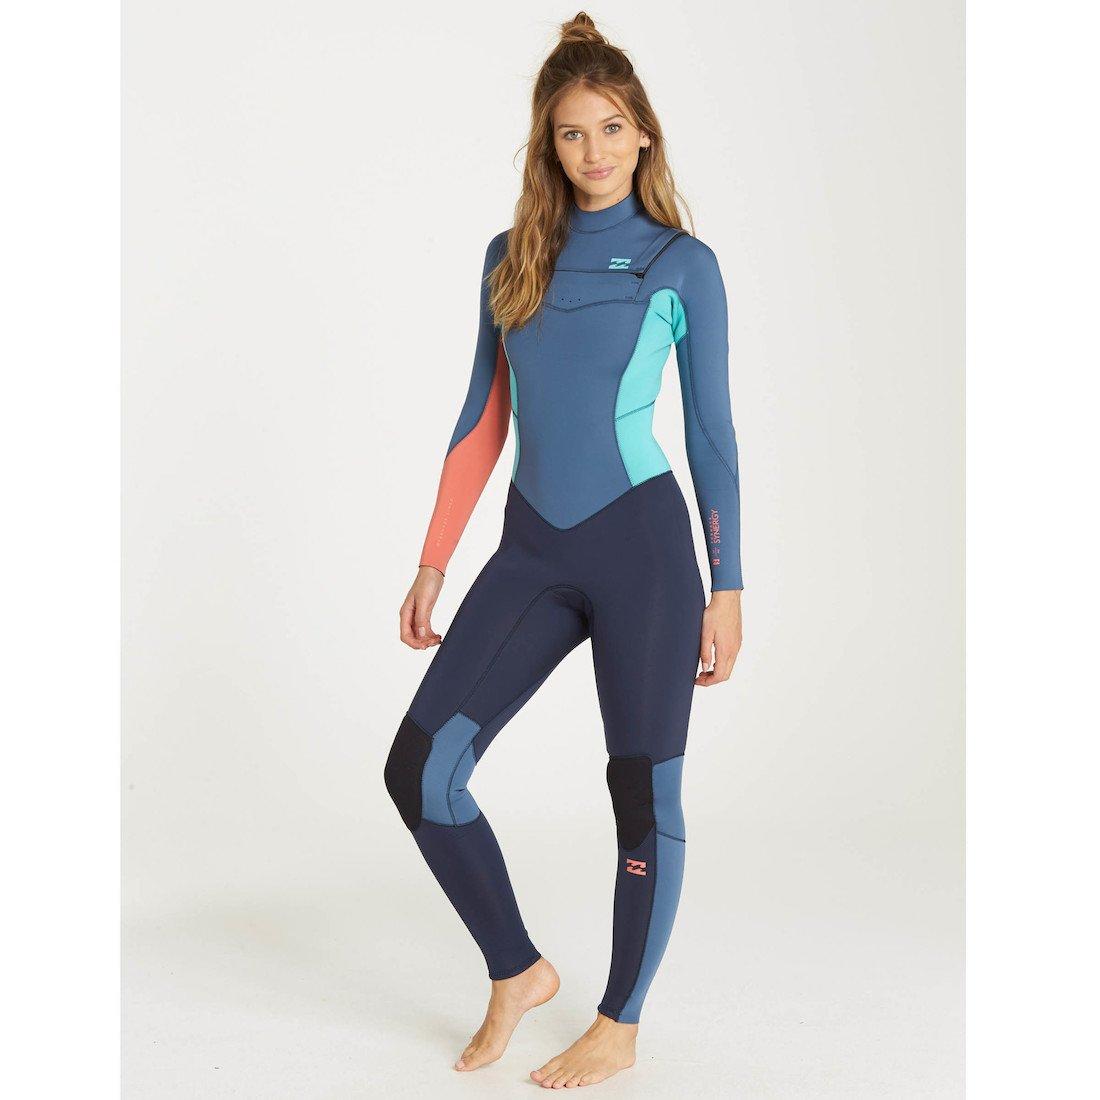 12e581178e billabong slate blue chest zip Ladies womens girls winter wetsuit surf  surfing 5 4 5